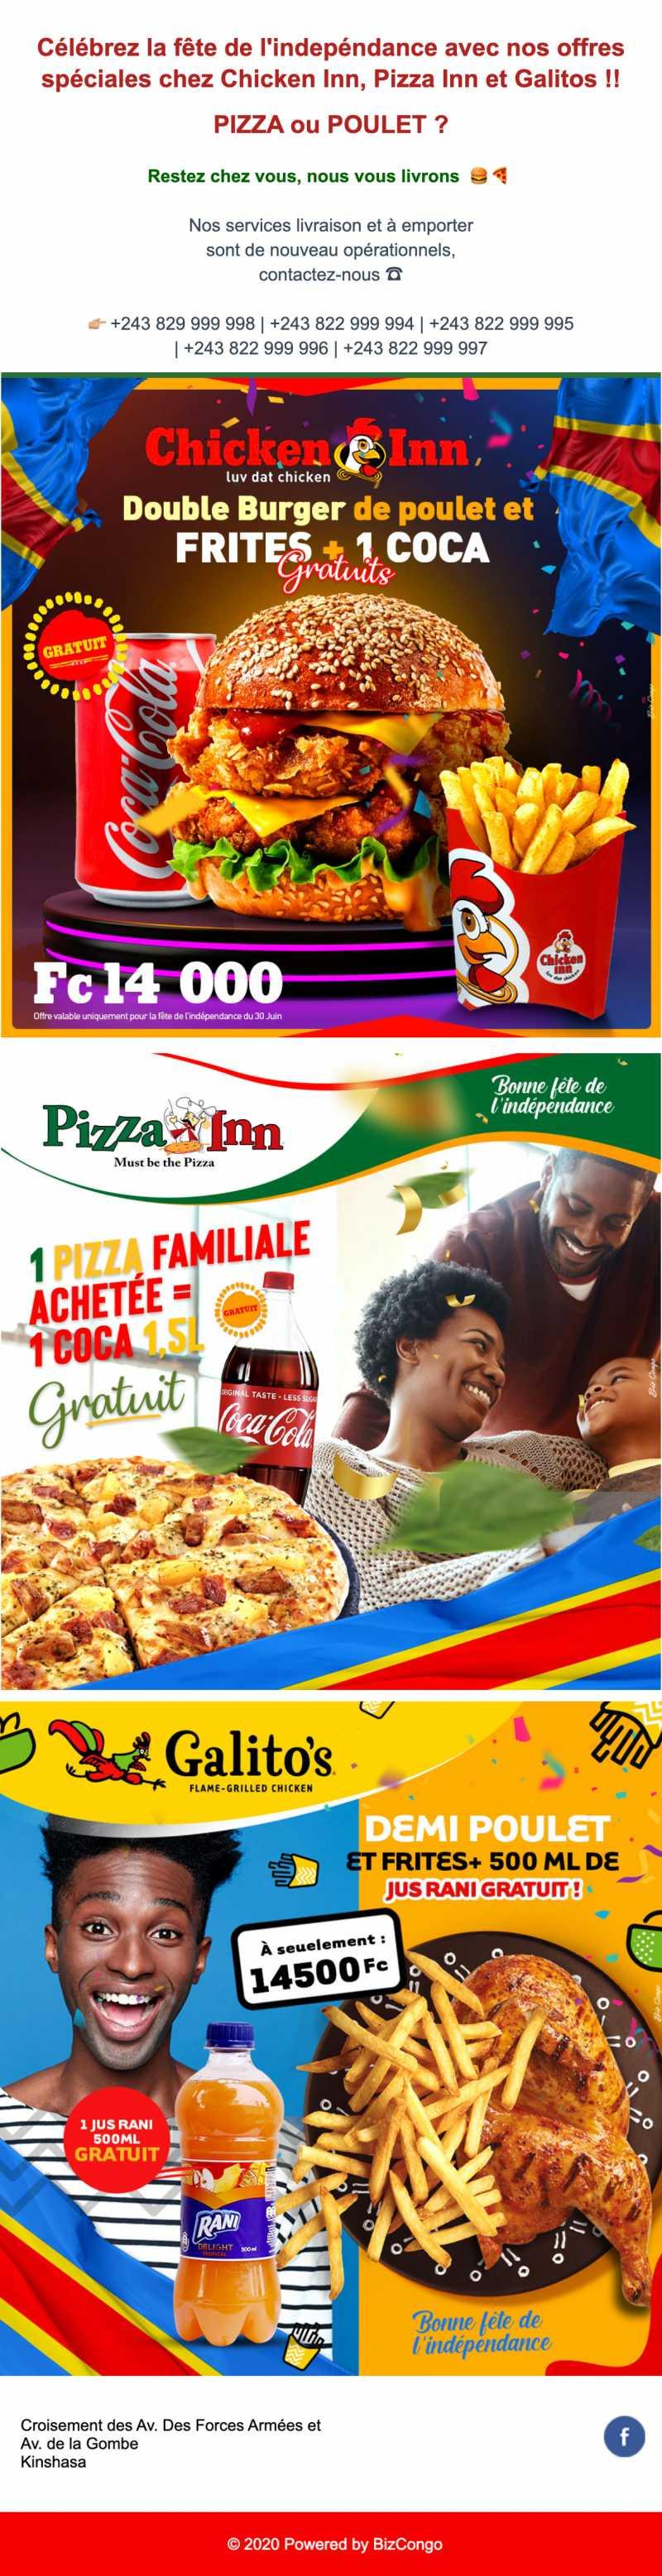 FOOD COURT Kinshasa